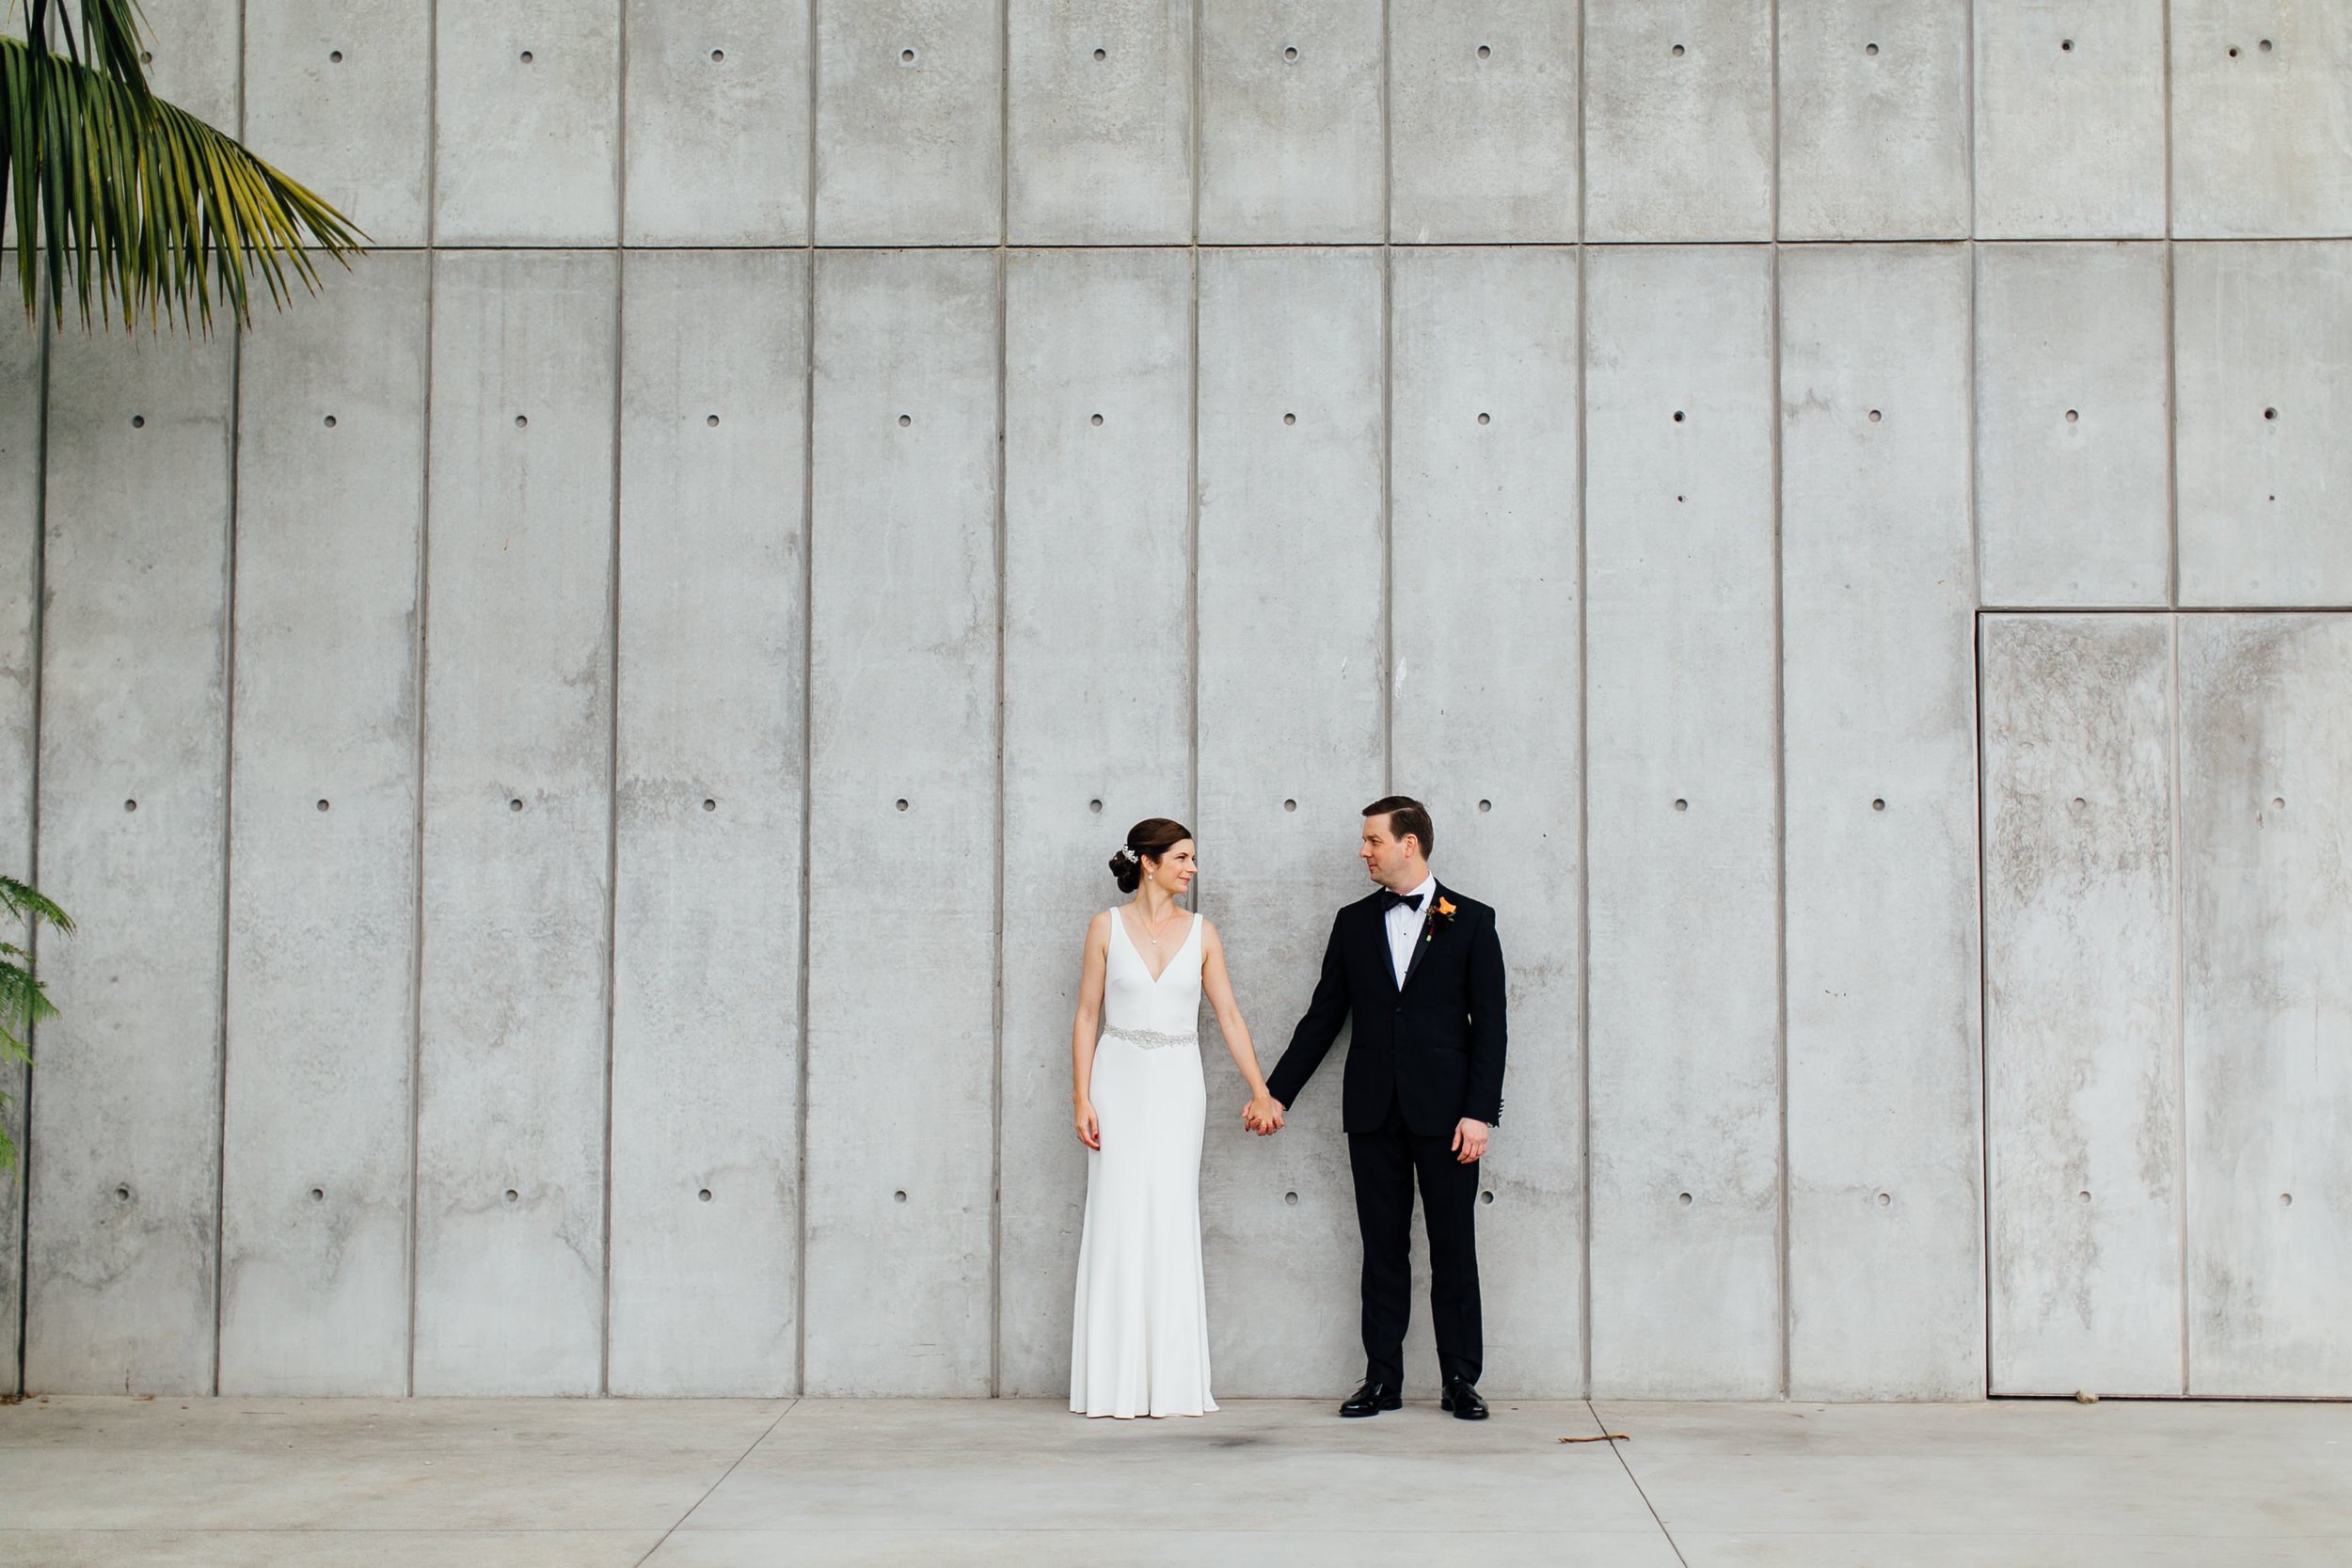 Wedding_KathleenMichael_BG_Portraits-280.jpg